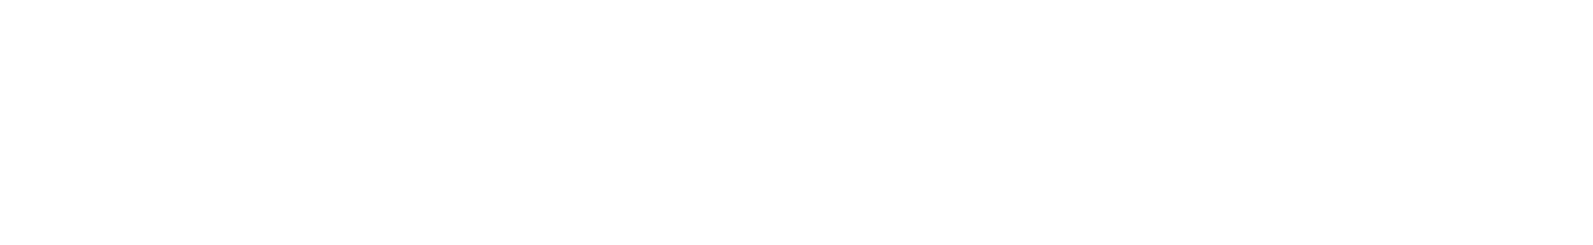 sigma homes logo white.png